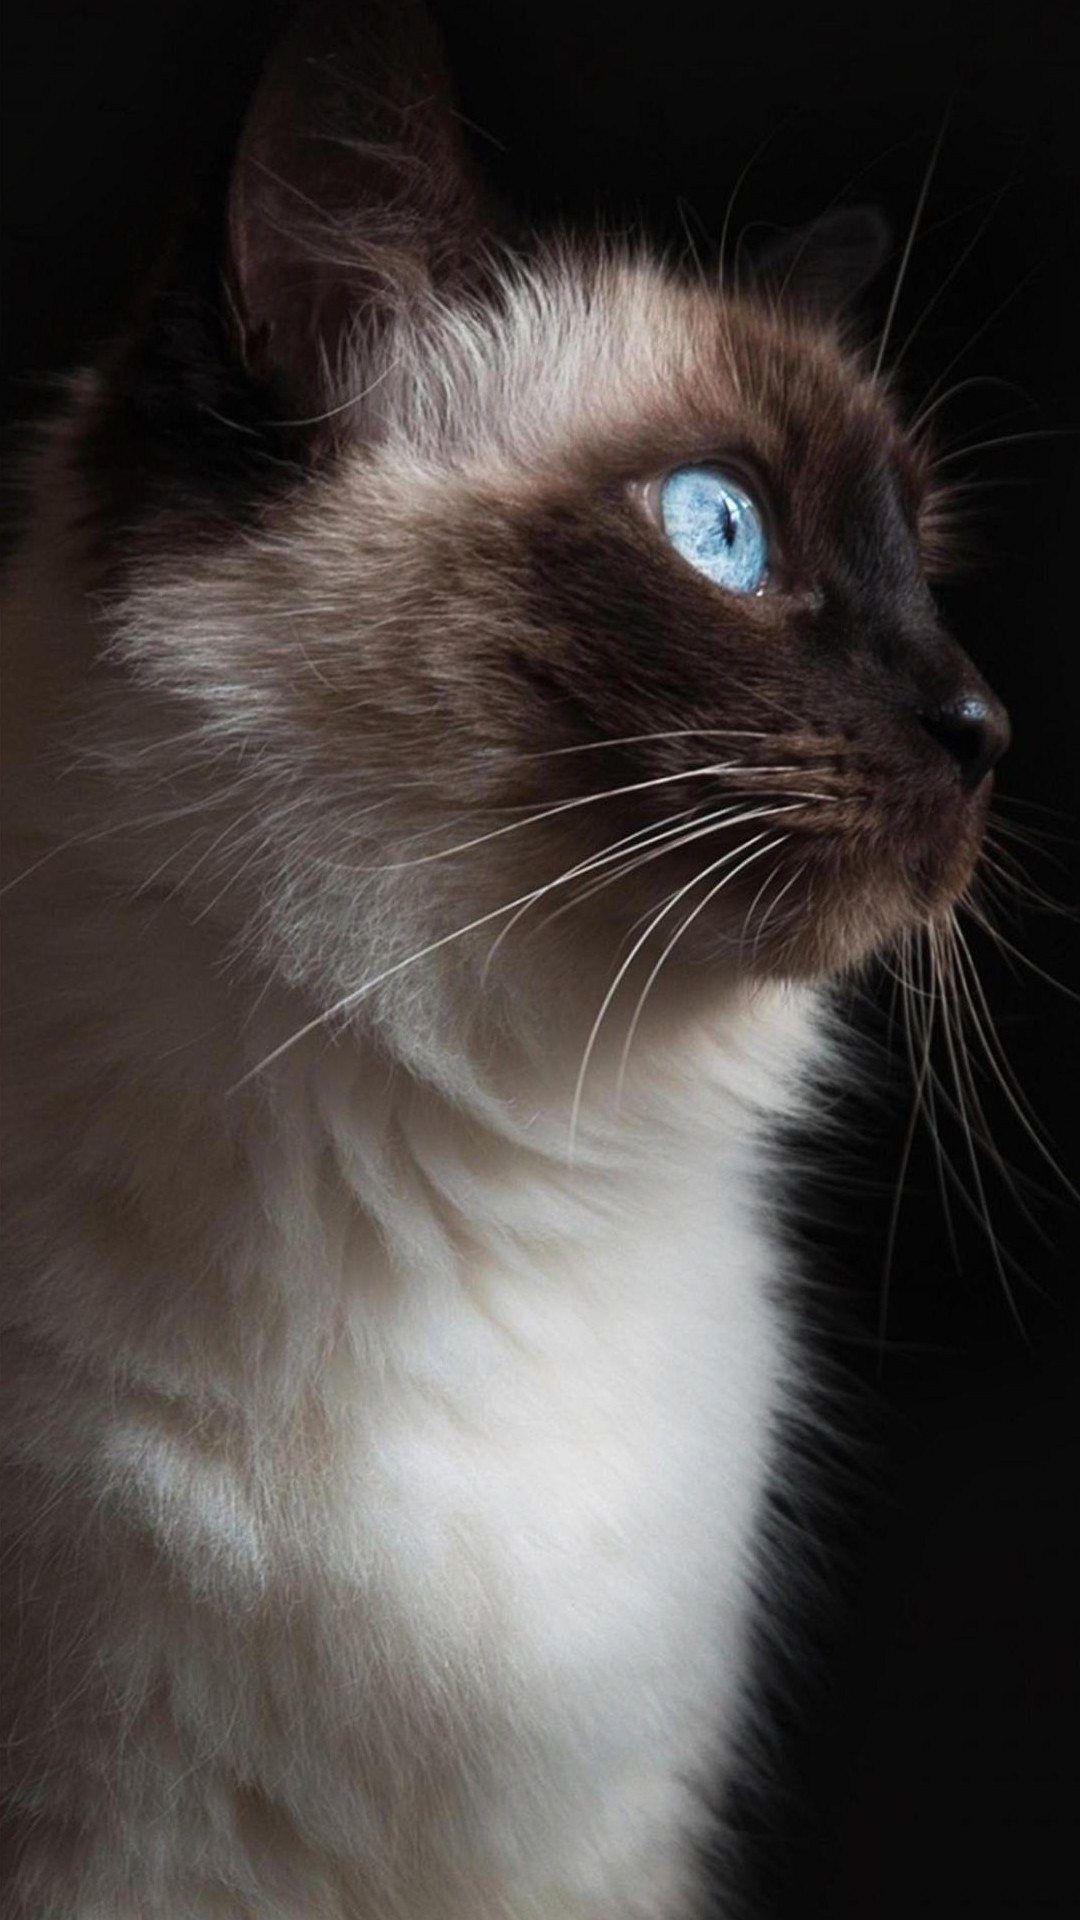 20 Iphone Siamese Cat Wallpaper In 2020 Cat Wallpaper Siamese Cats Cat Background